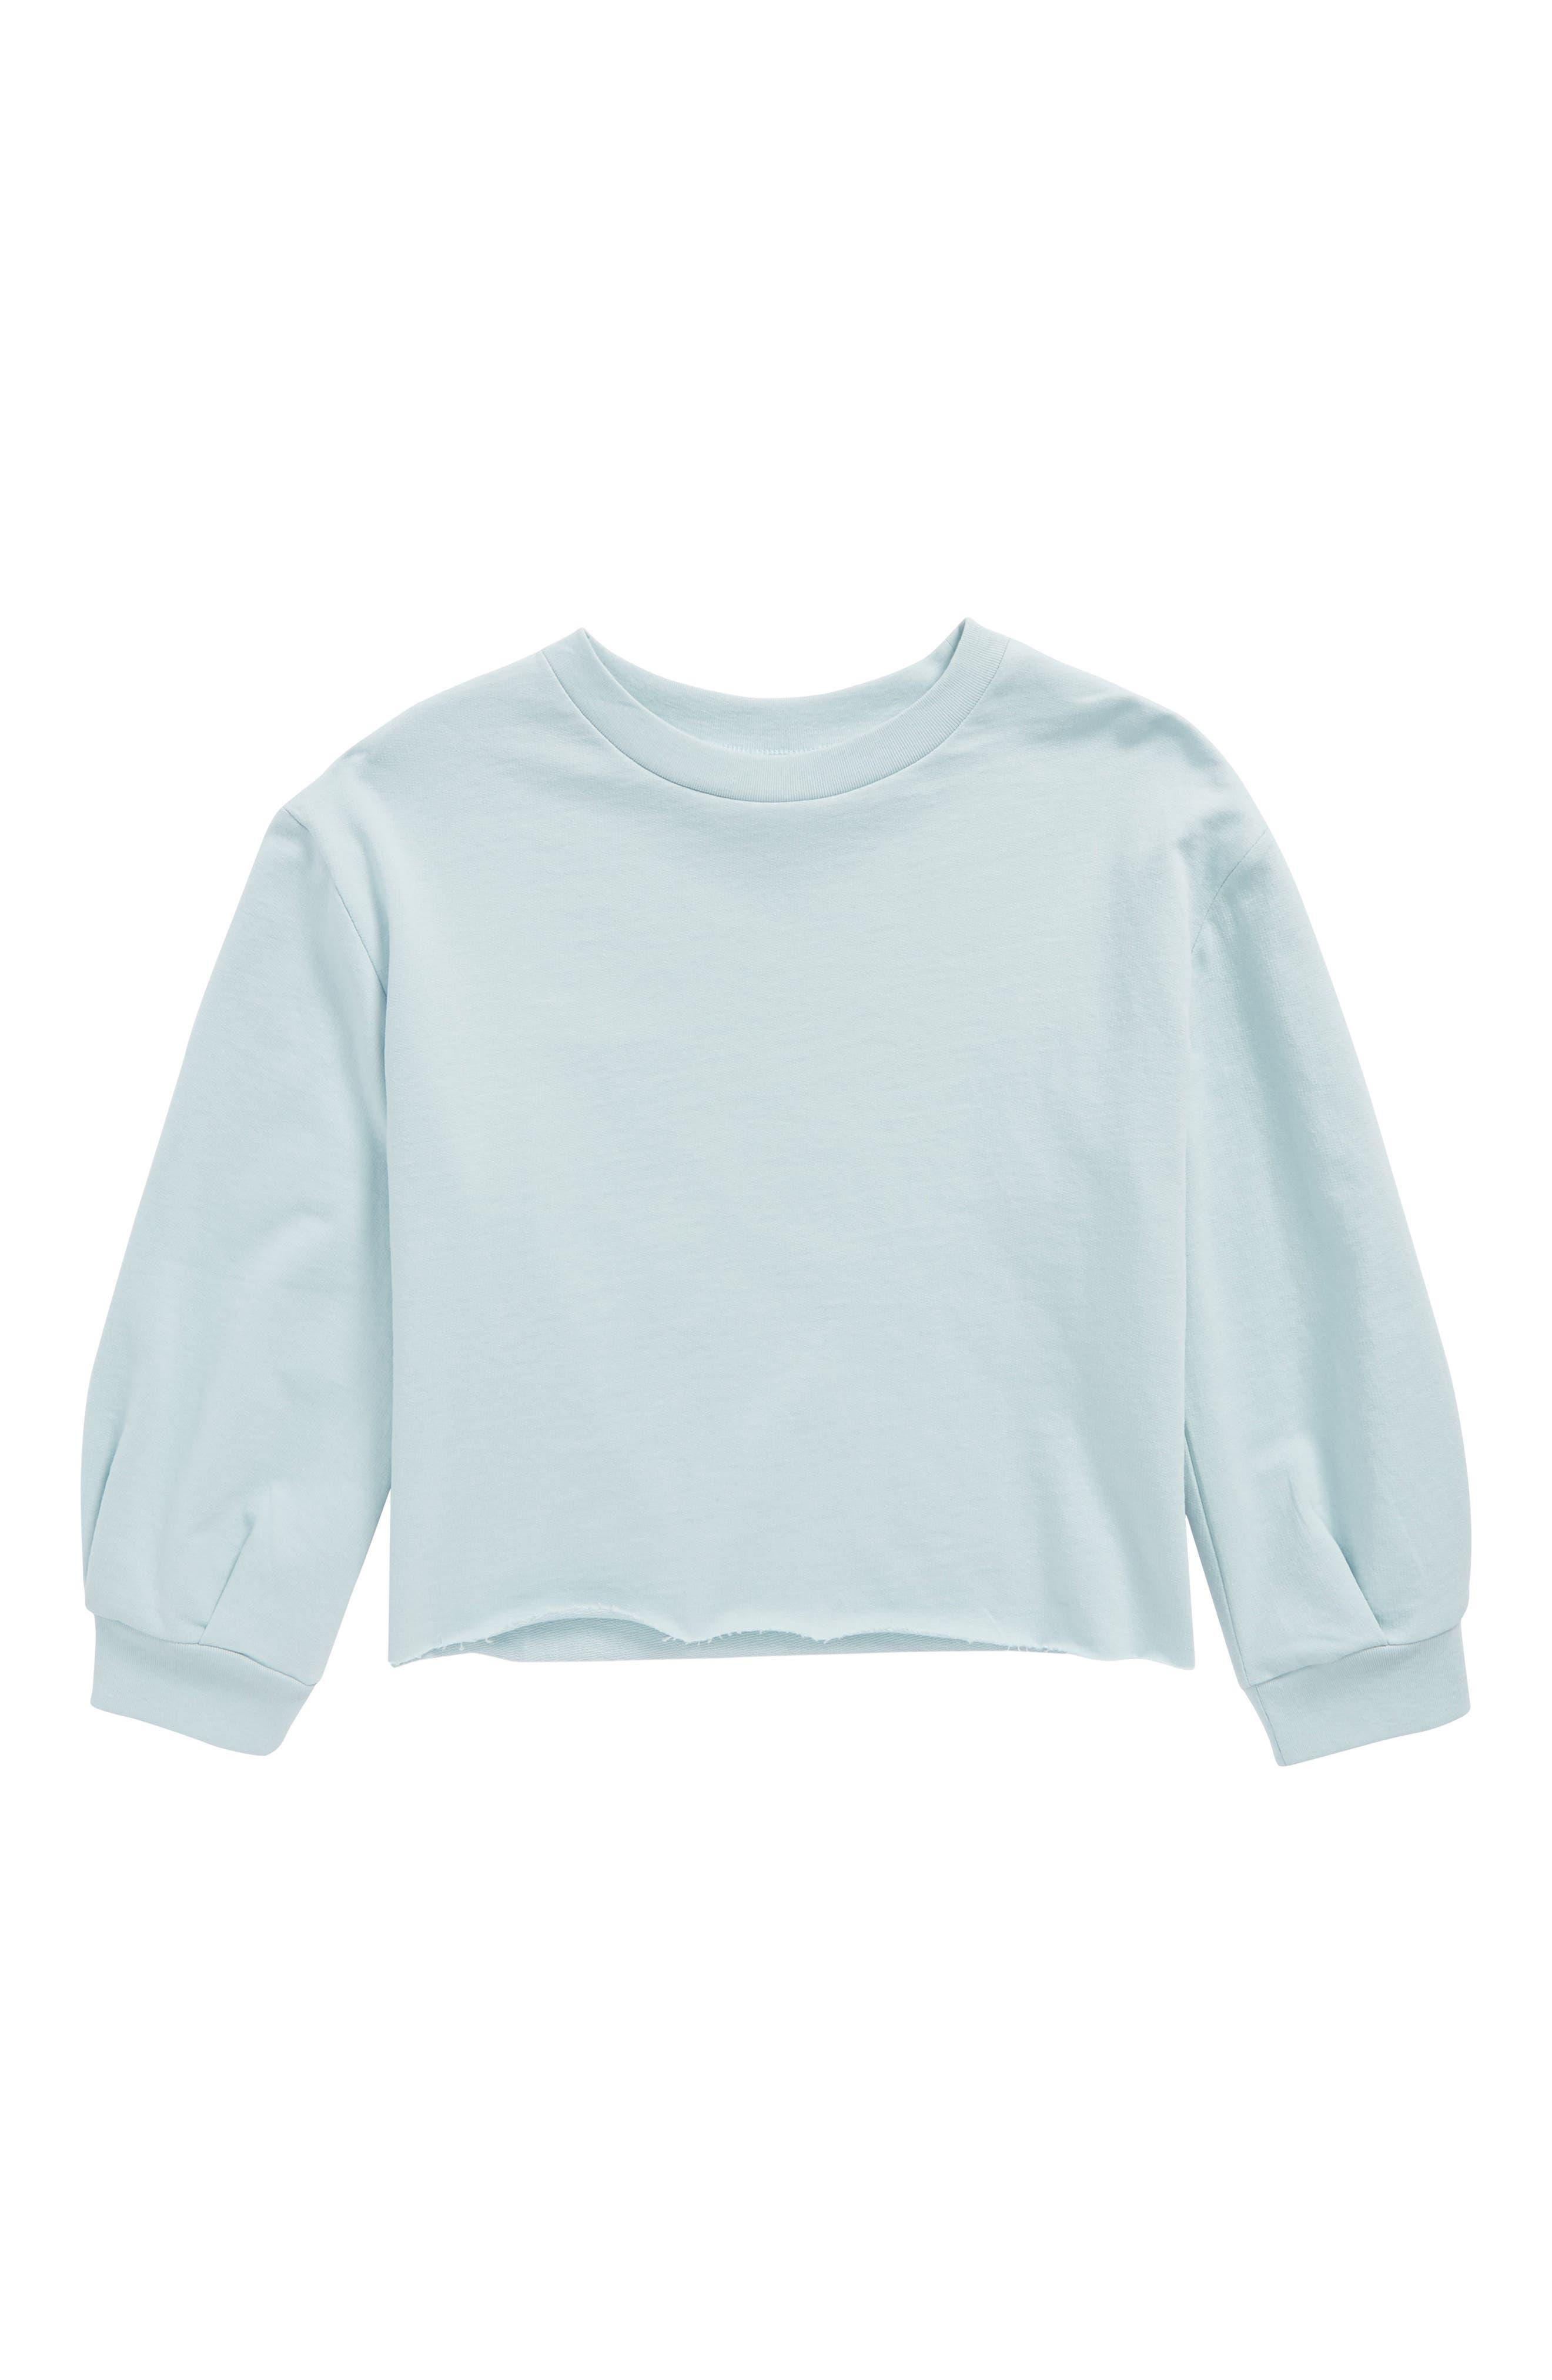 Raw Edge Sweatshirt,                             Main thumbnail 1, color,                             Blue Sterling